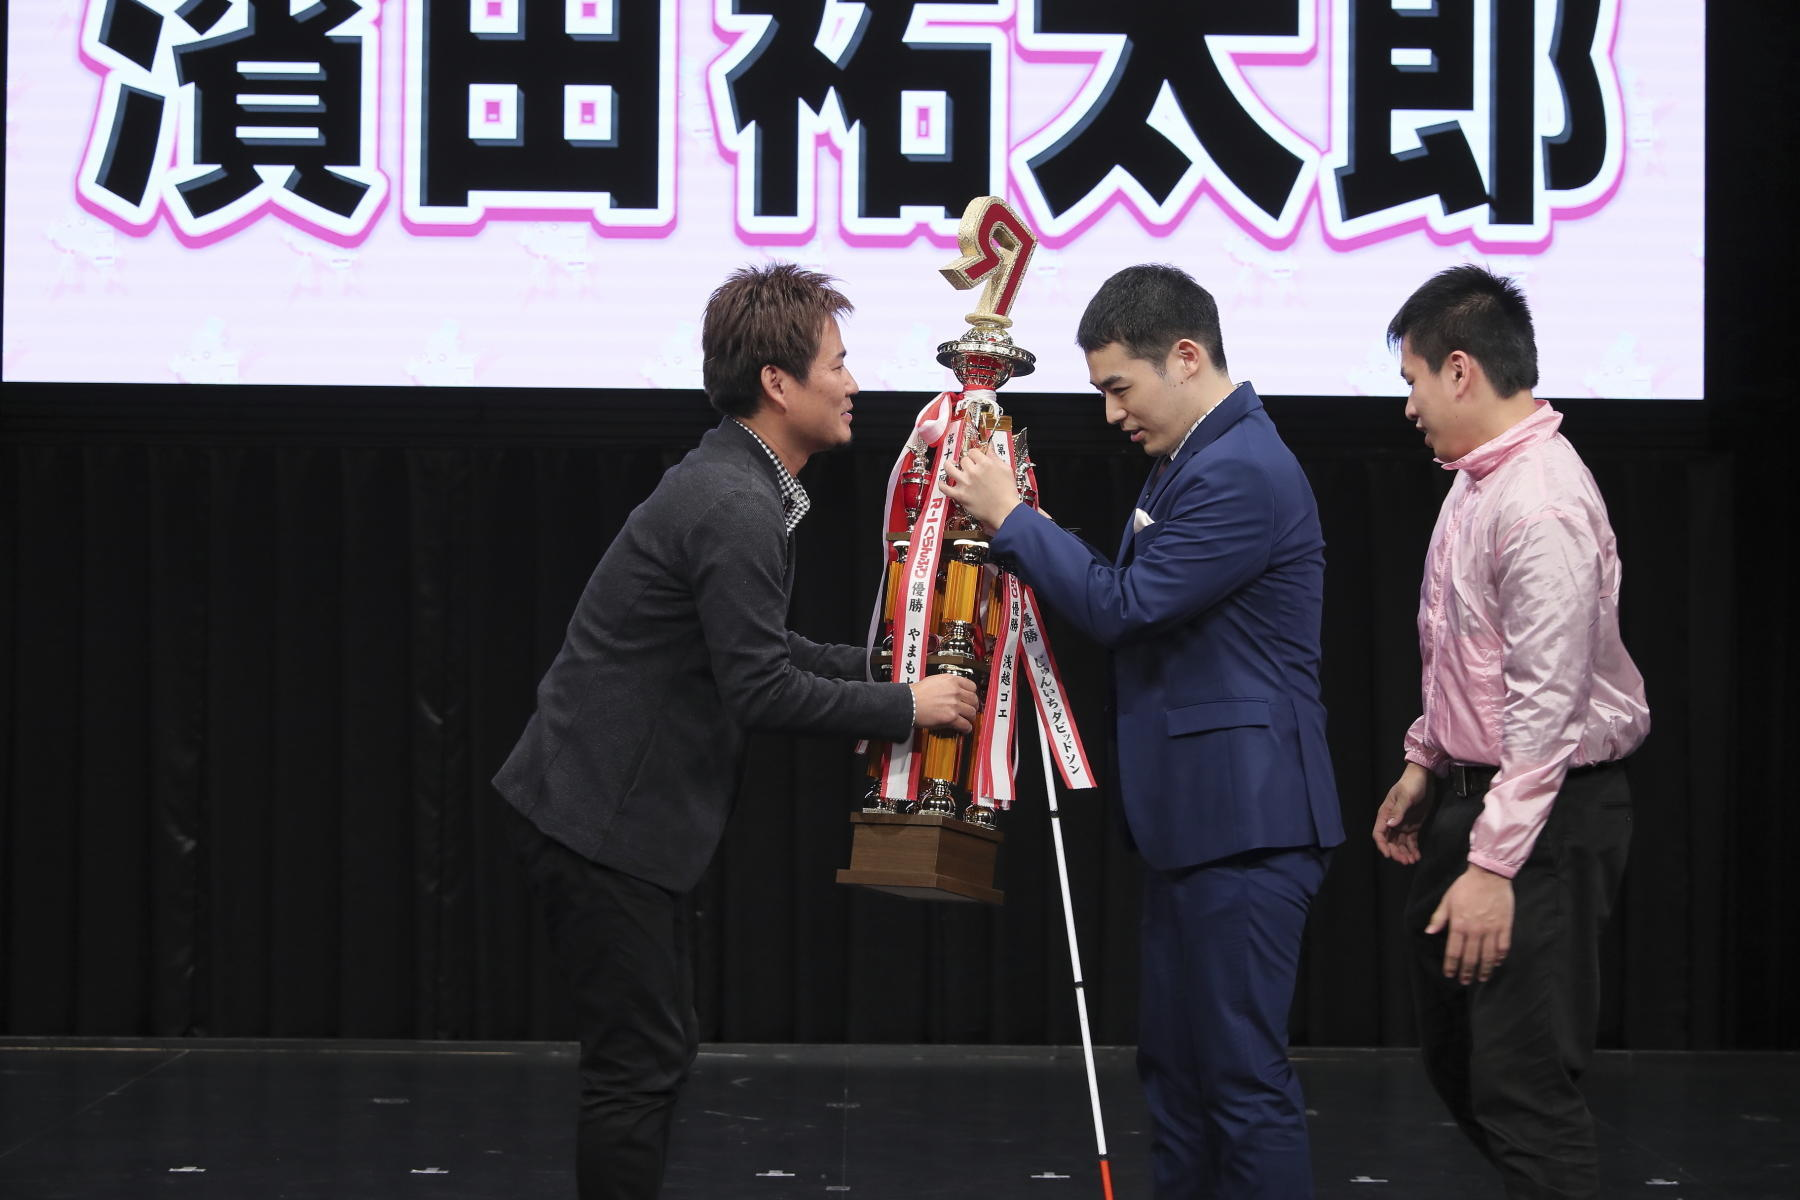 http://news.yoshimoto.co.jp/20181130142815-b518bfe7f606c1947a95798c31f6a2e9683d0a89.jpg